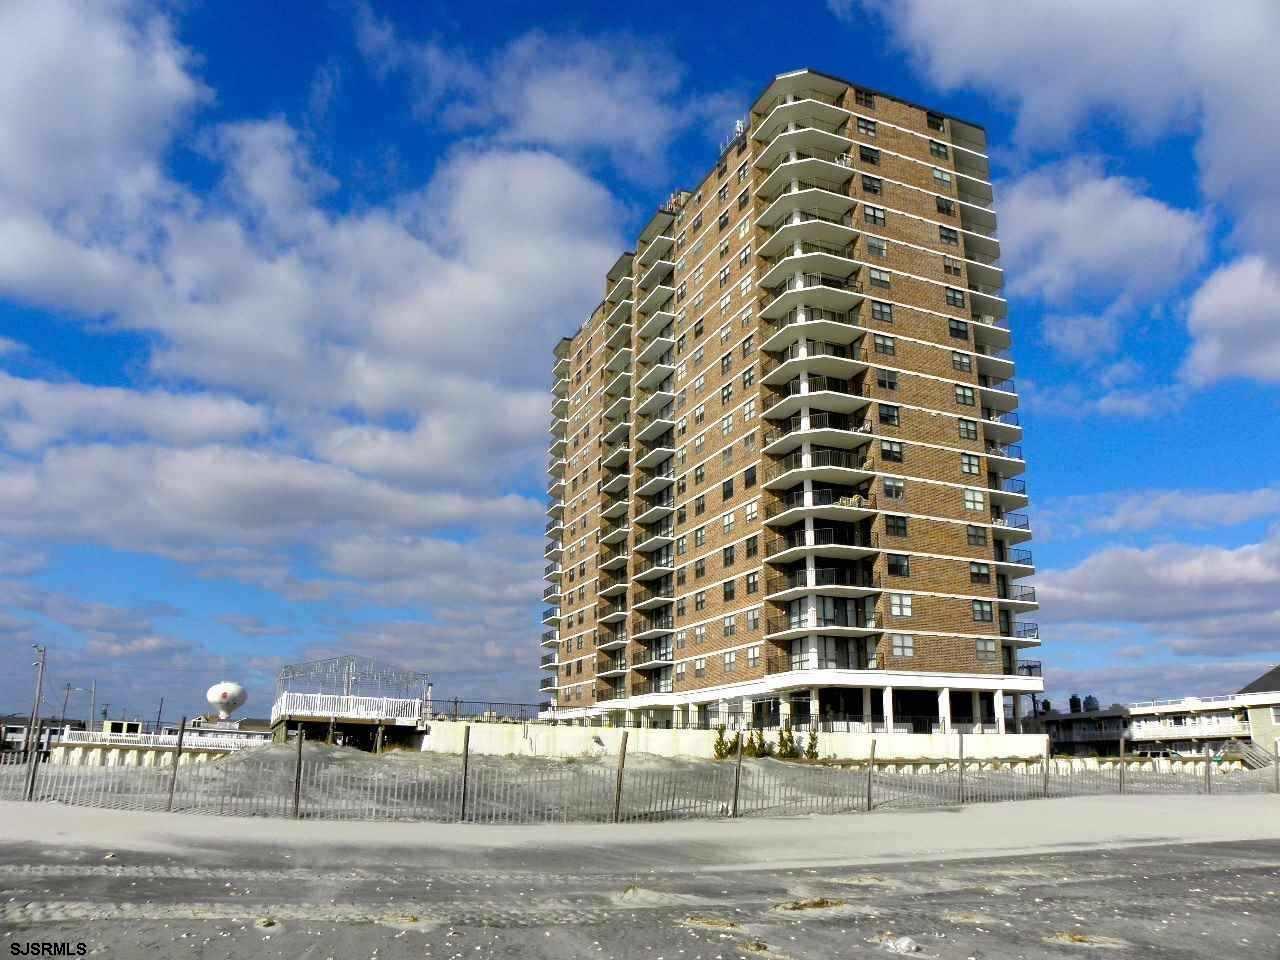 9100 Beach Ave, Margate, NJ 08402